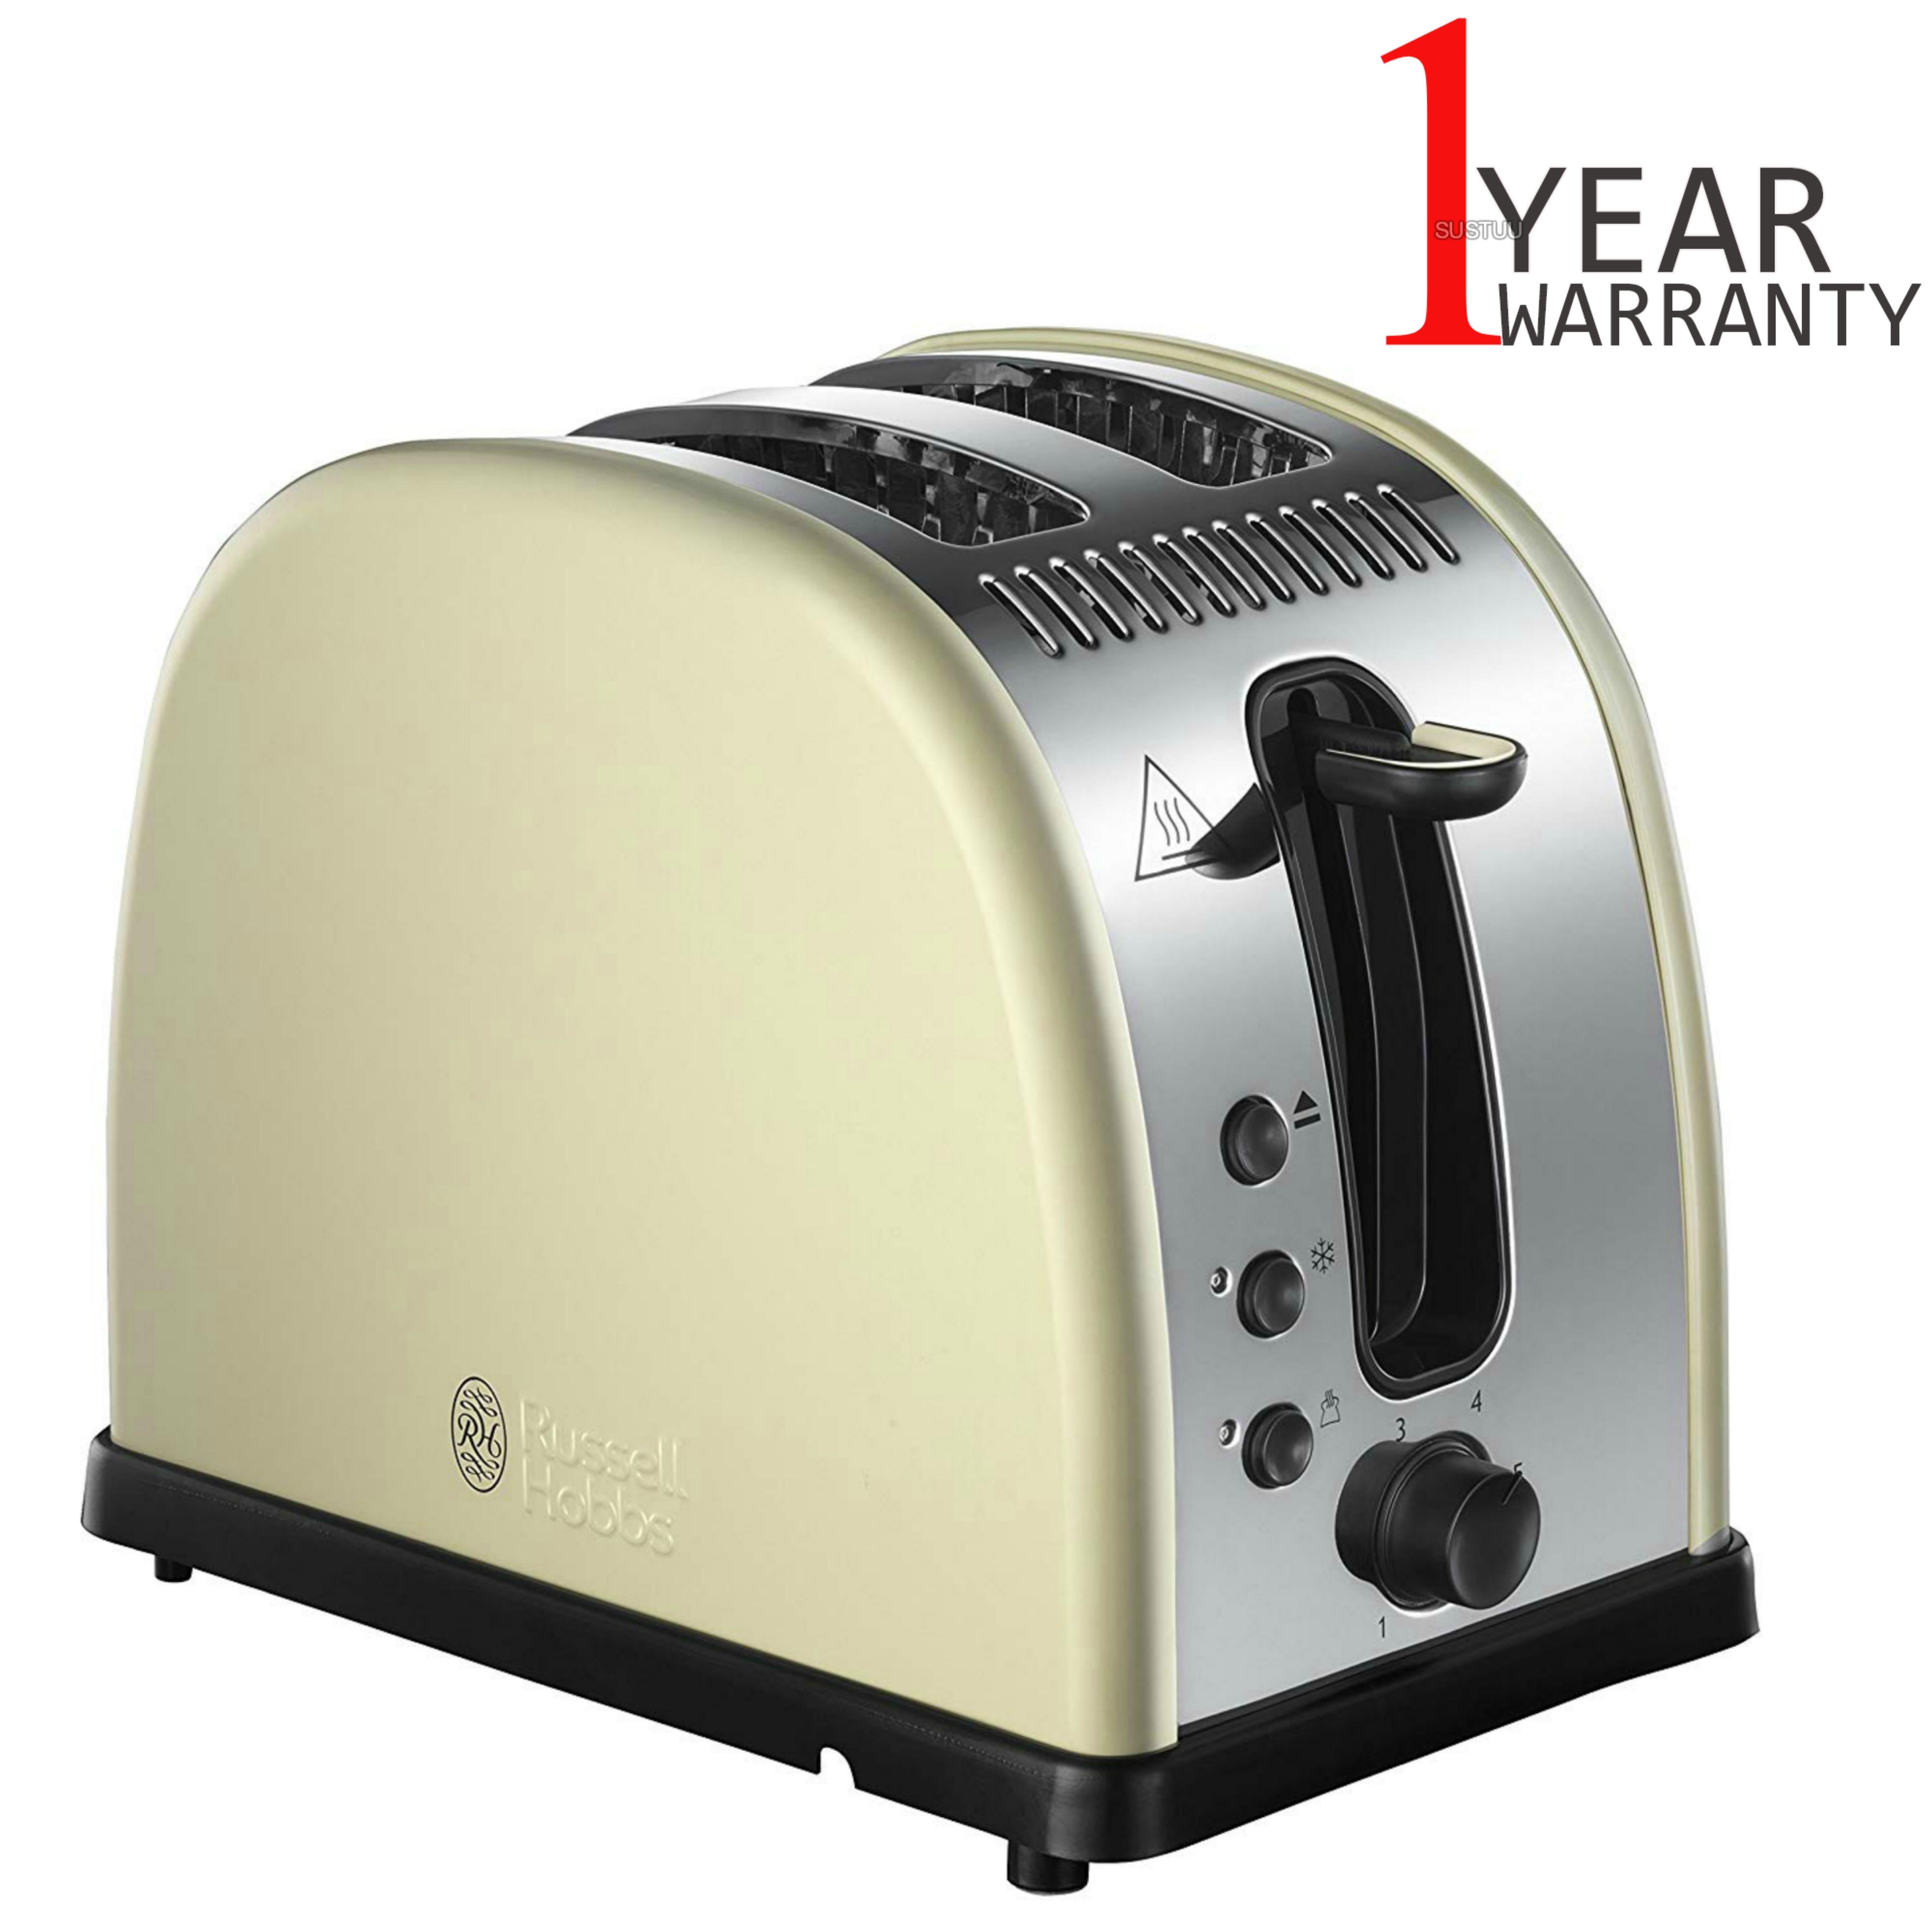 Russell Hobbs RU-21292 Legacy 2-Slice Toaster | Reheat Function | Wide Slot Cream